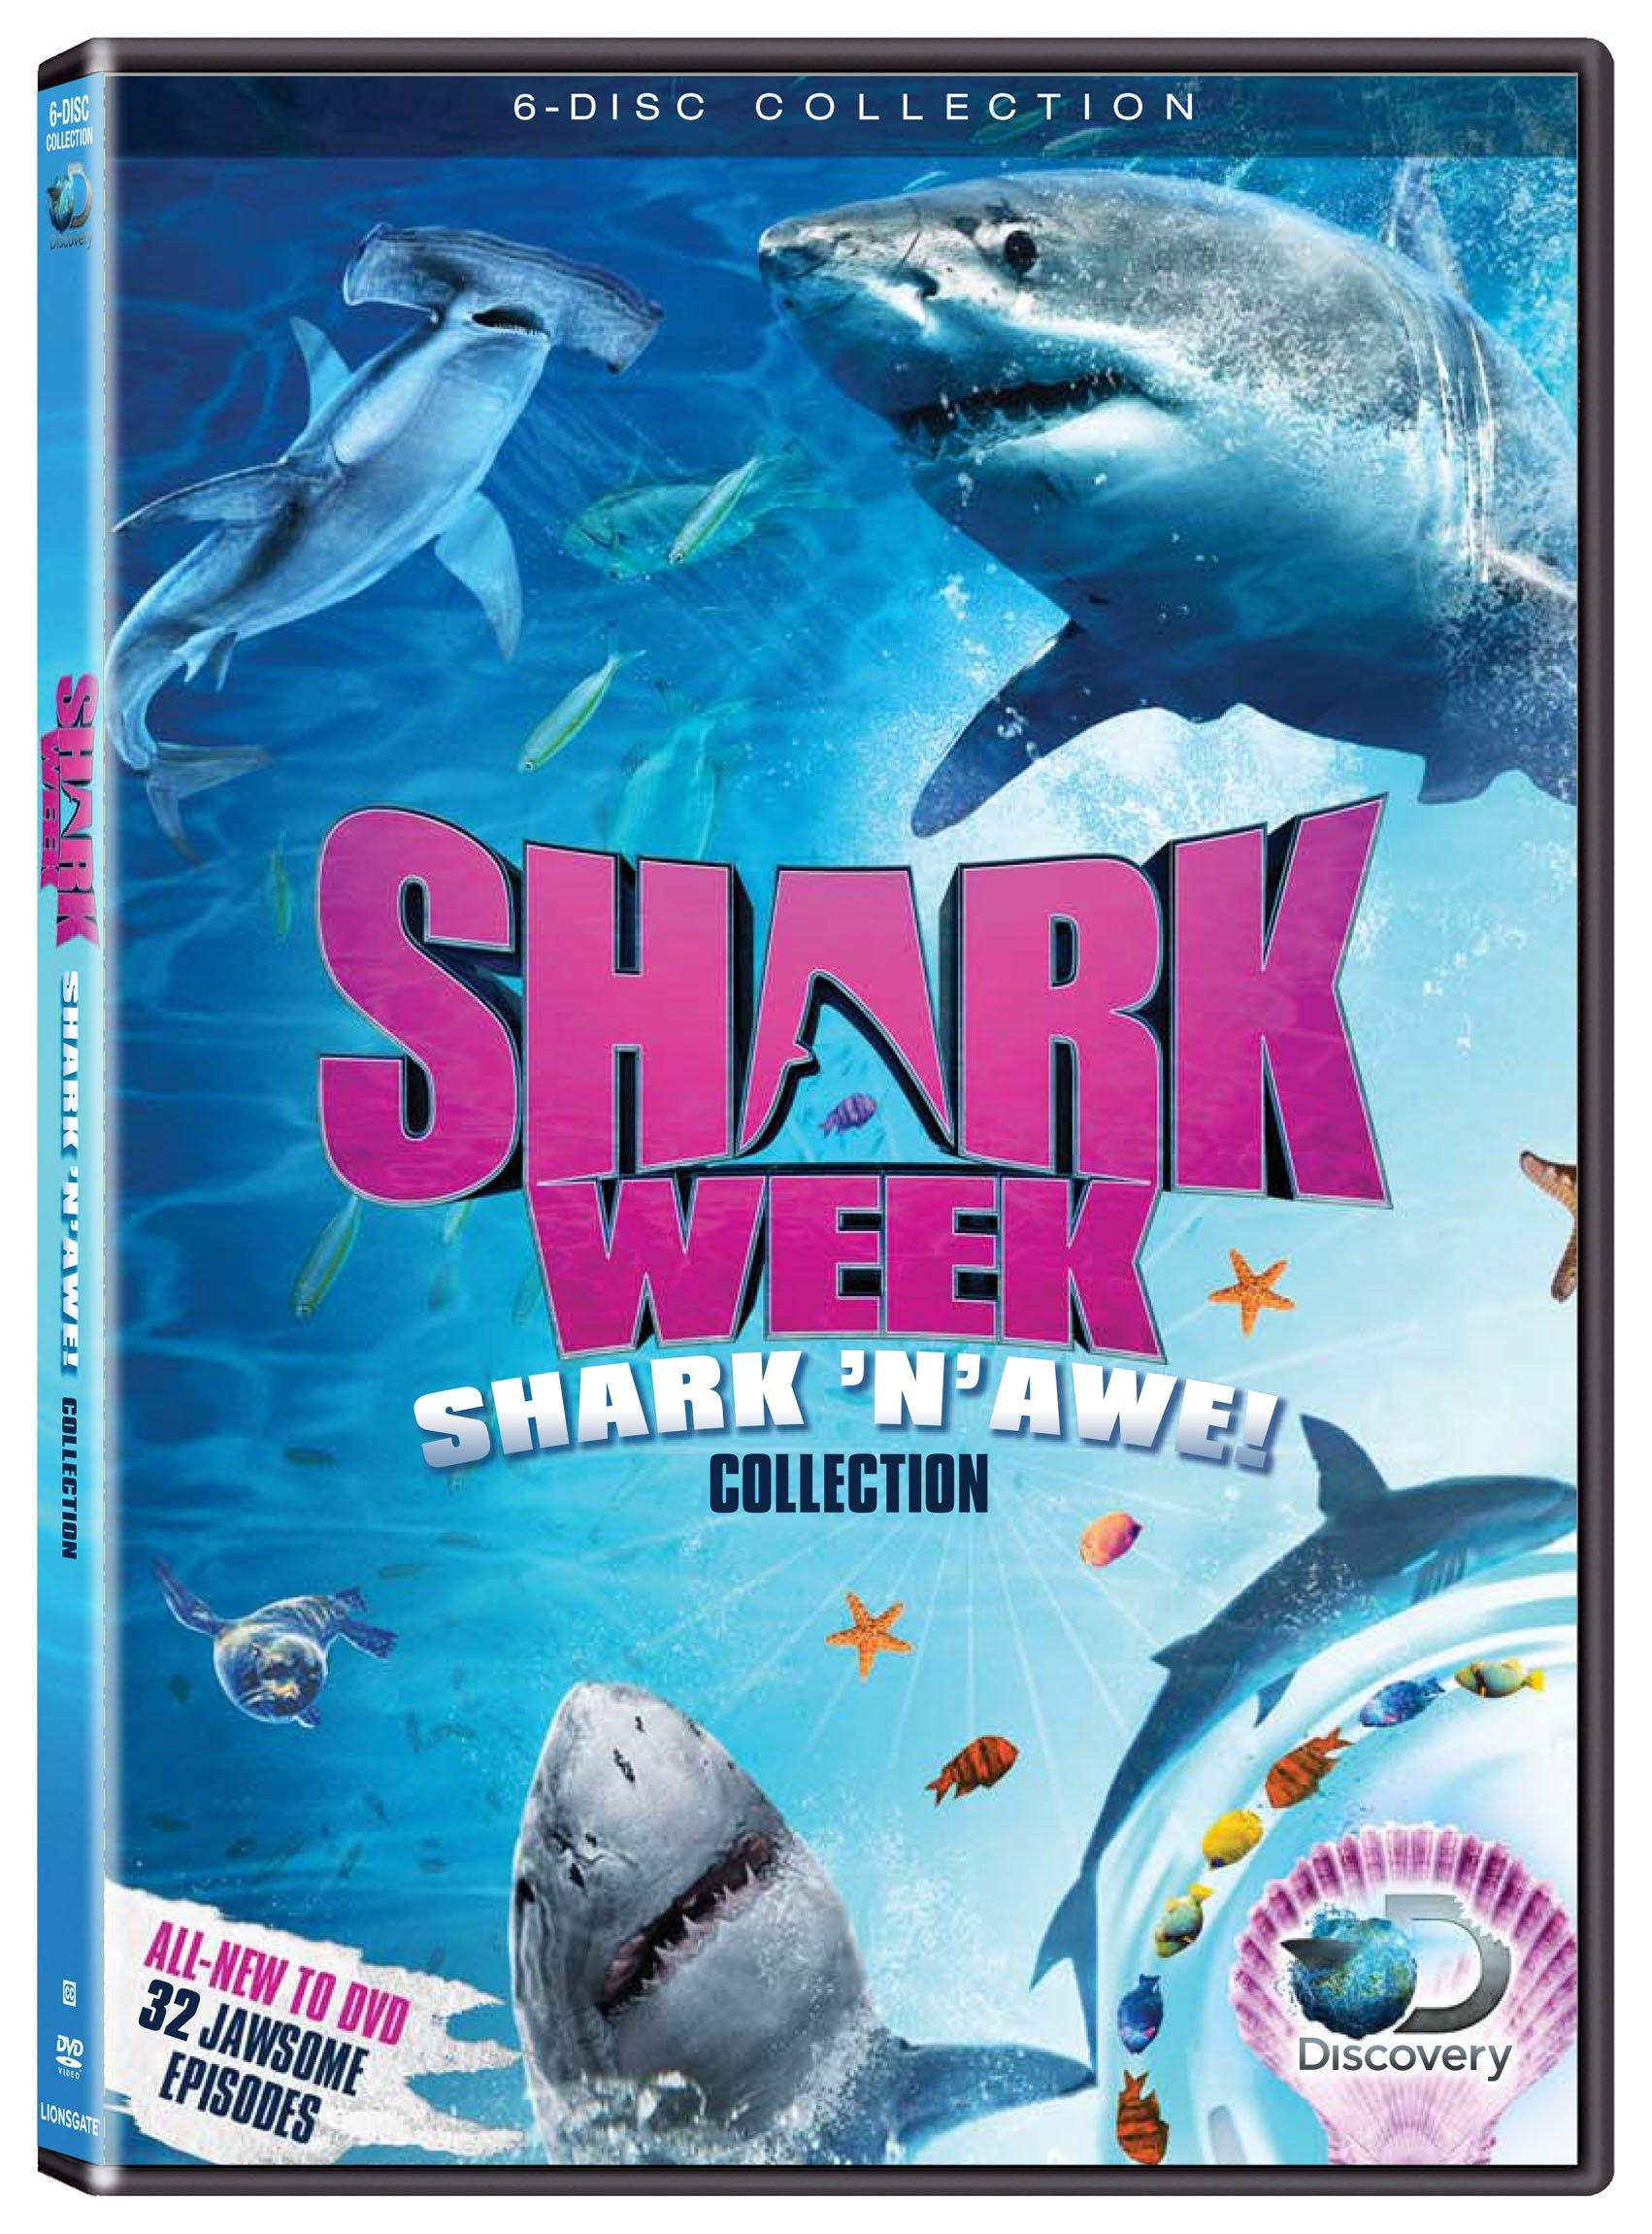 Shark Week: Shark 'N' Awe Collection [DVD]